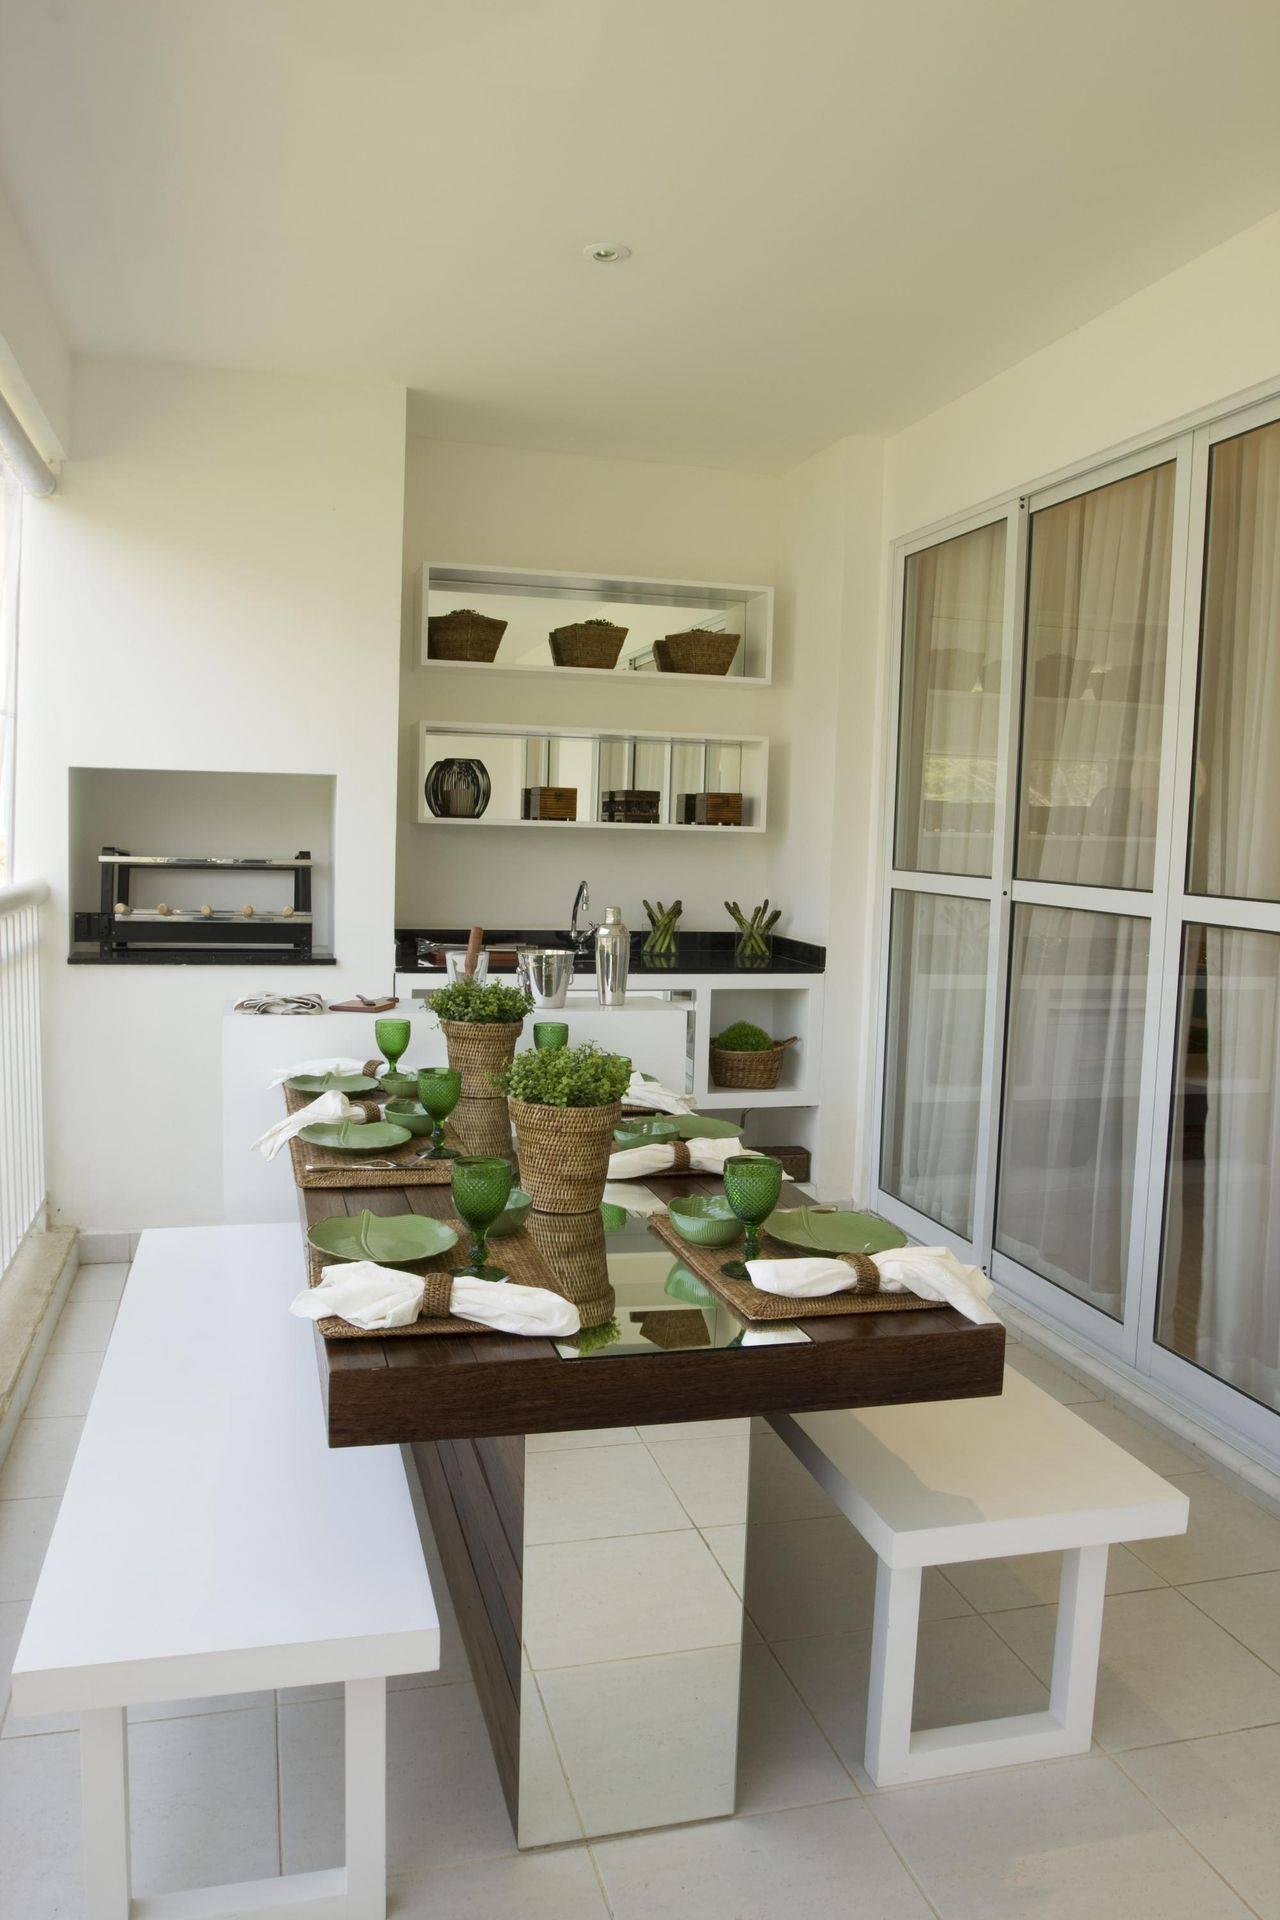 churrasqueira eletrica varanda verde janaina leibovitchh 986